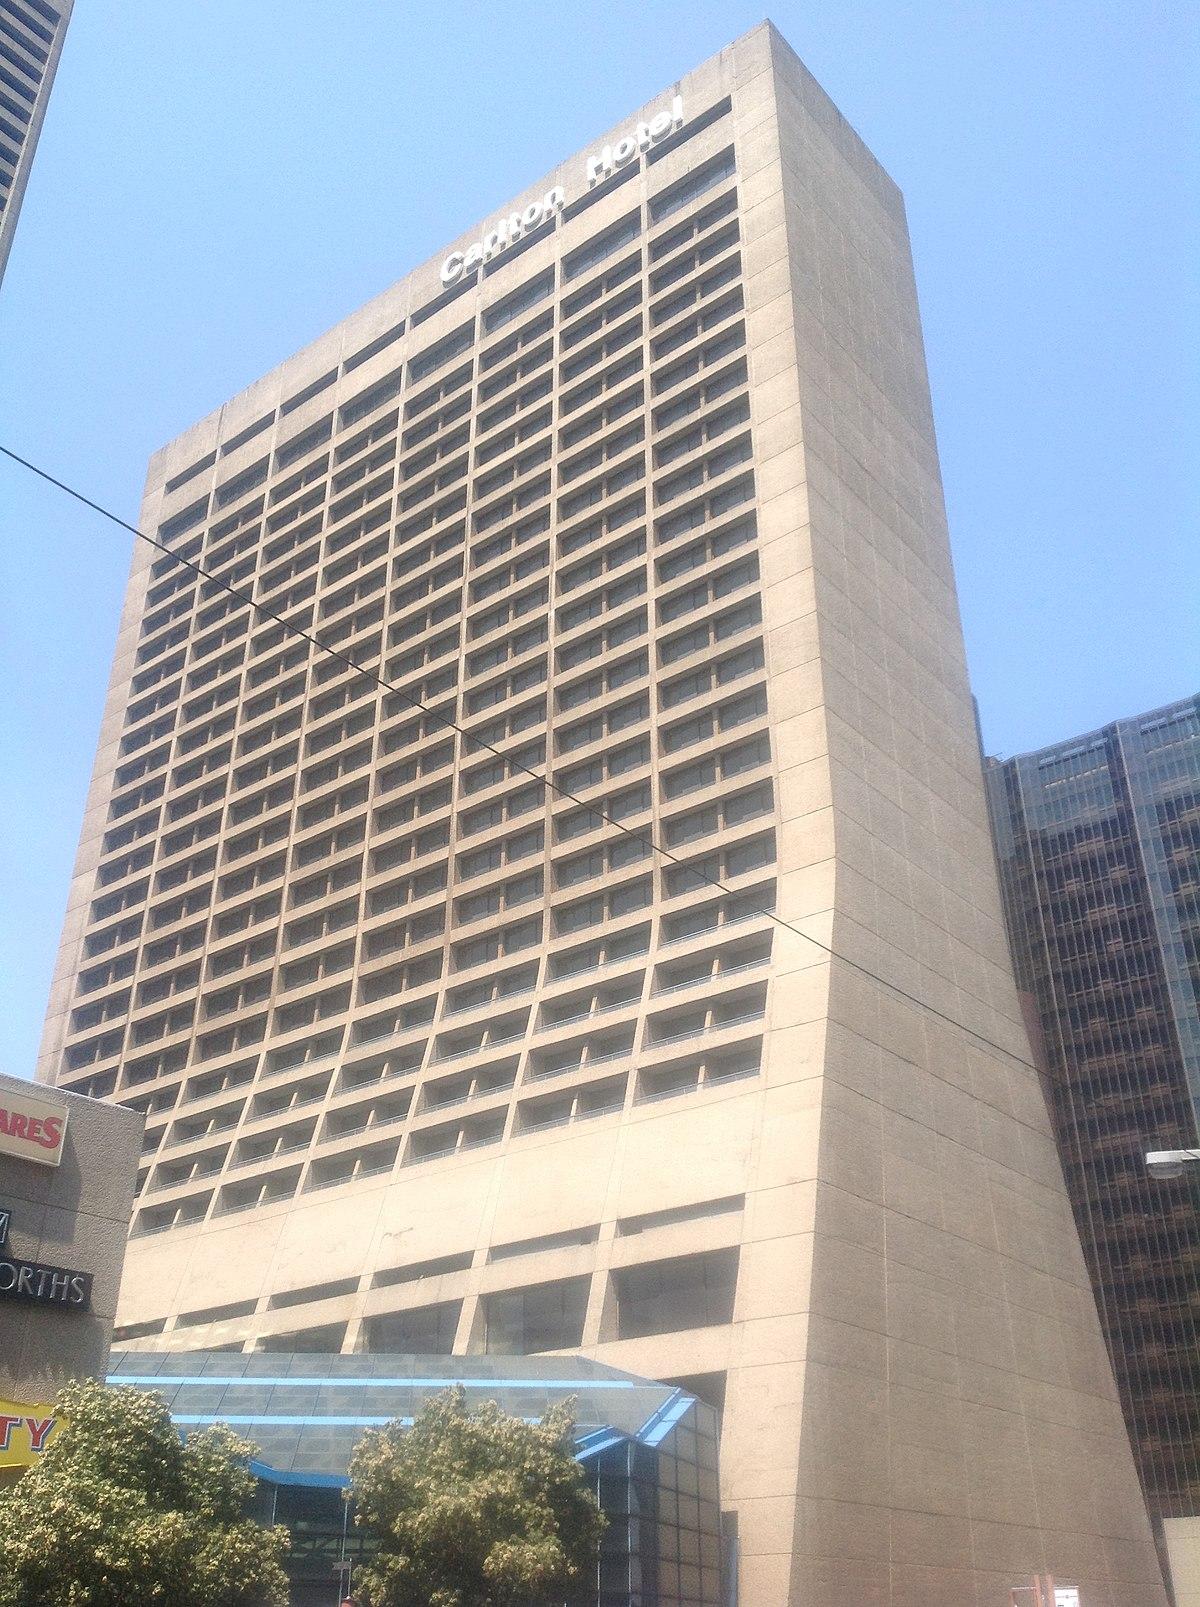 Carlton Hotel Johannesburg Wikipedia